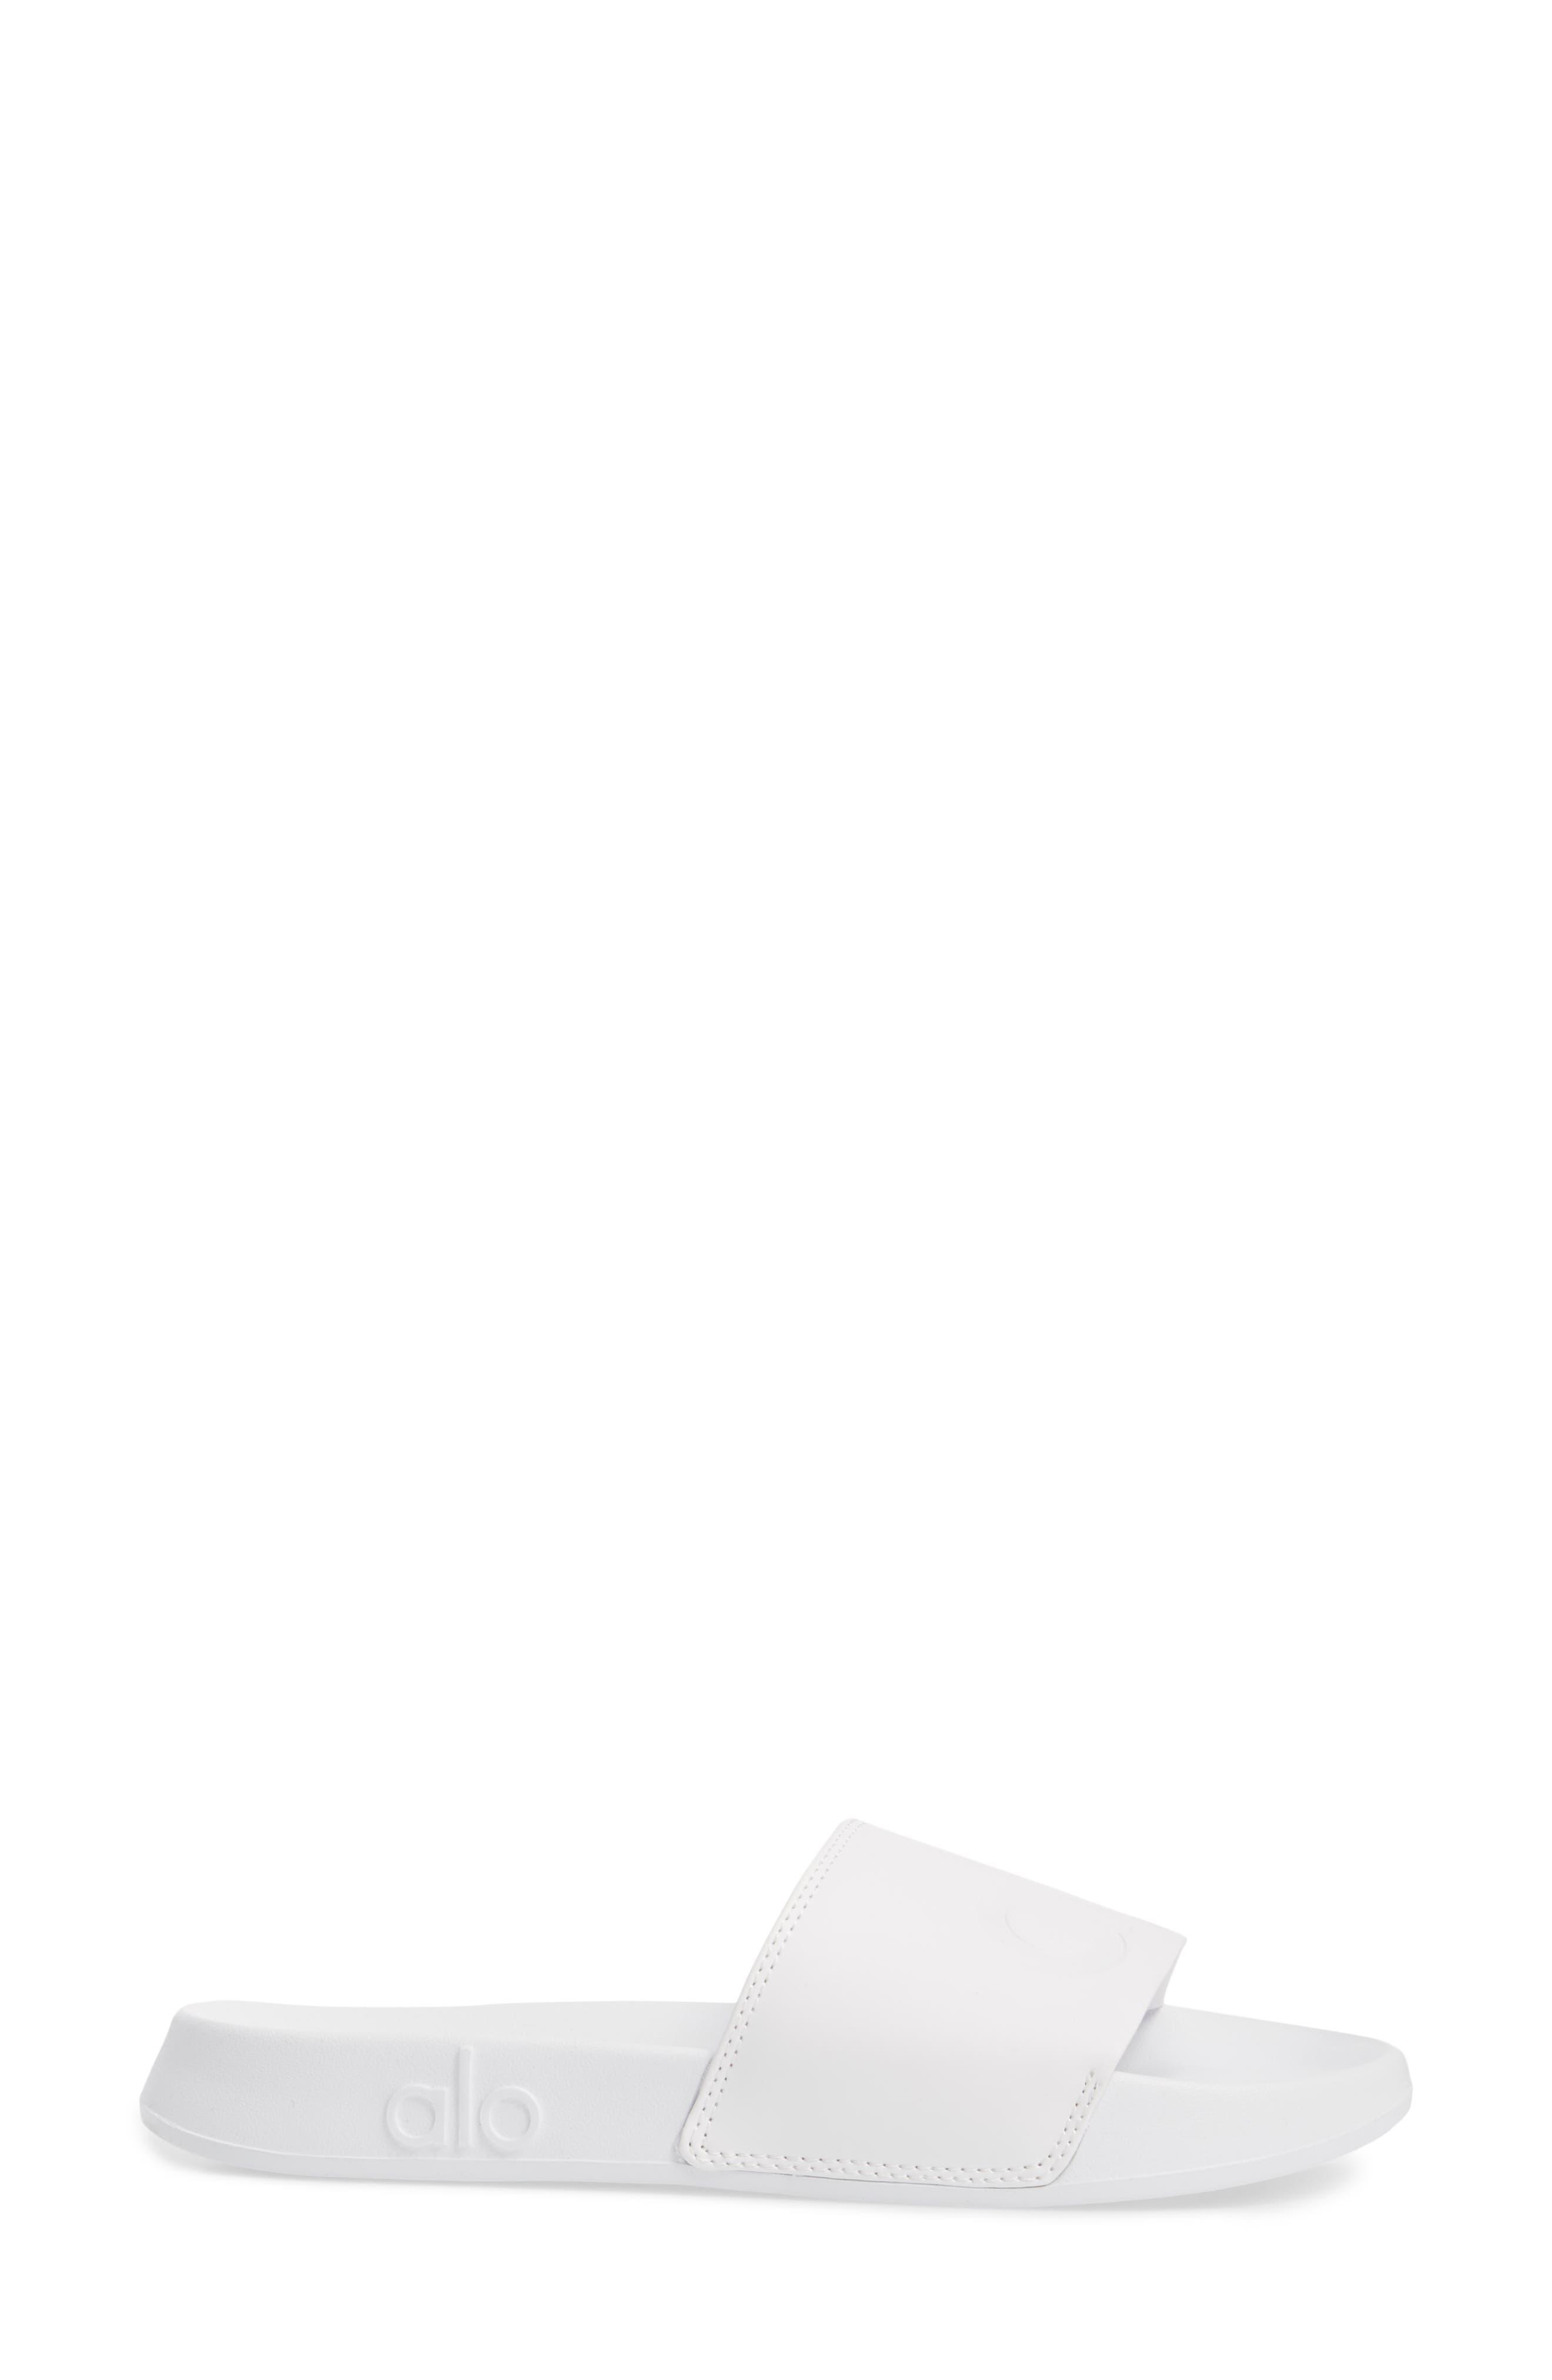 It 2 Sandal,                             Alternate thumbnail 3, color,                             White/ White